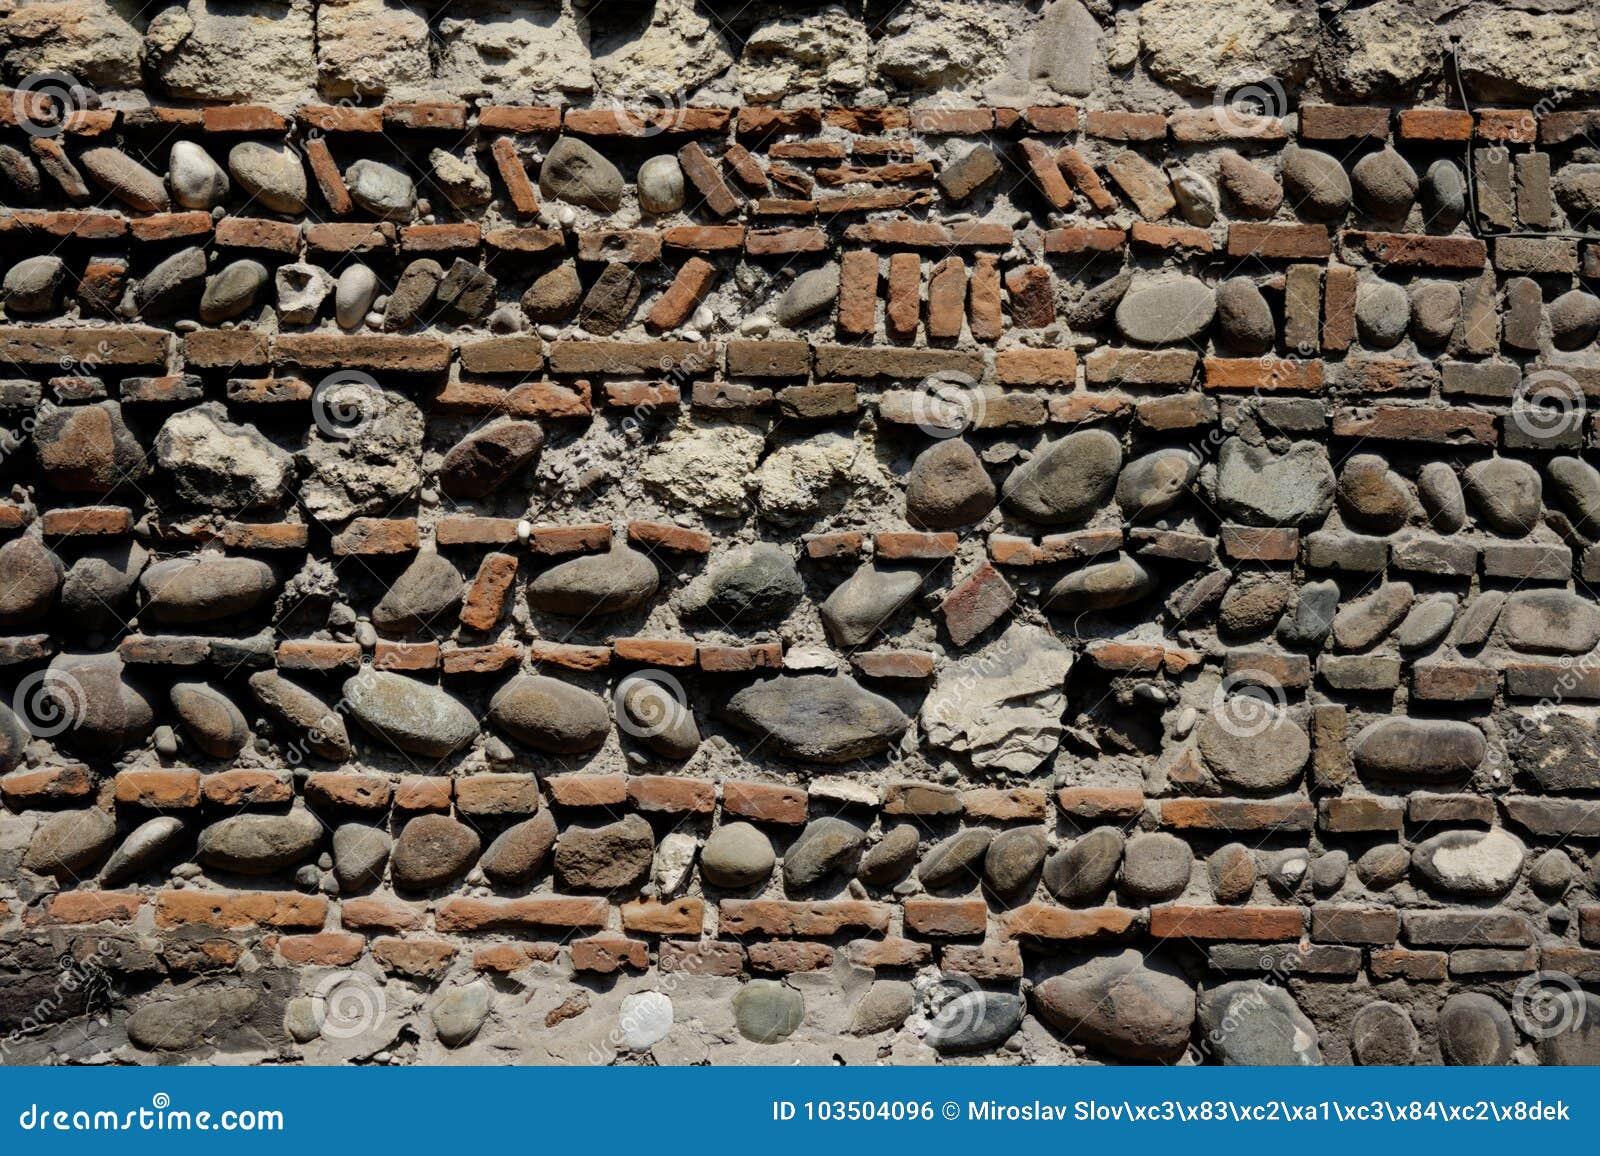 Unique Cartoon Stone Texture Seamless